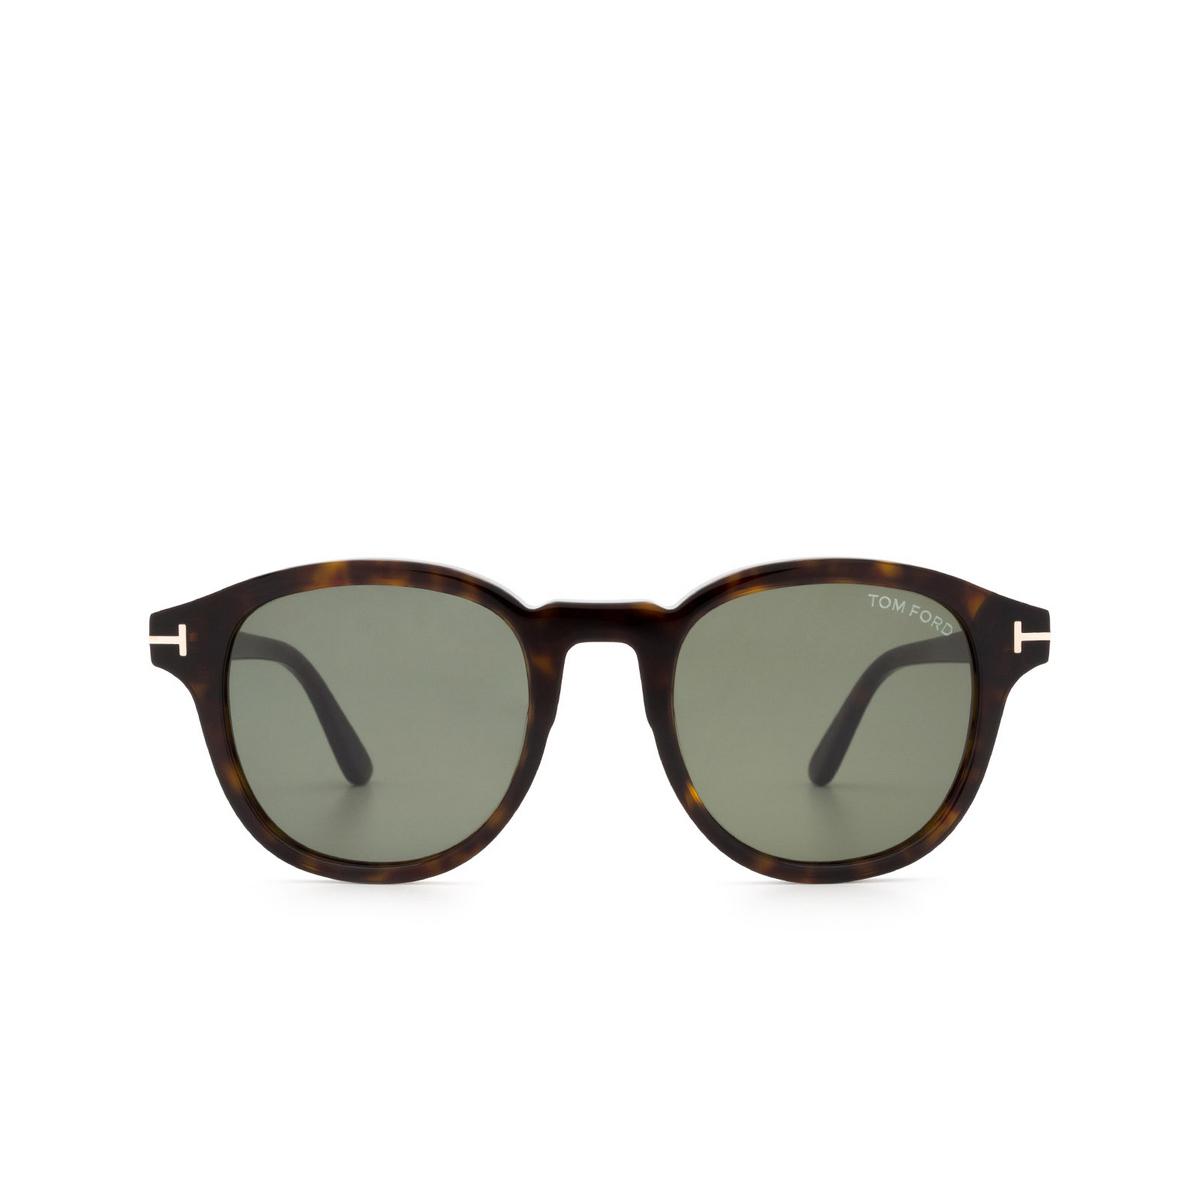 Tom Ford® Square Sunglasses: Jameson FT0752 color Dark Havana 52N.